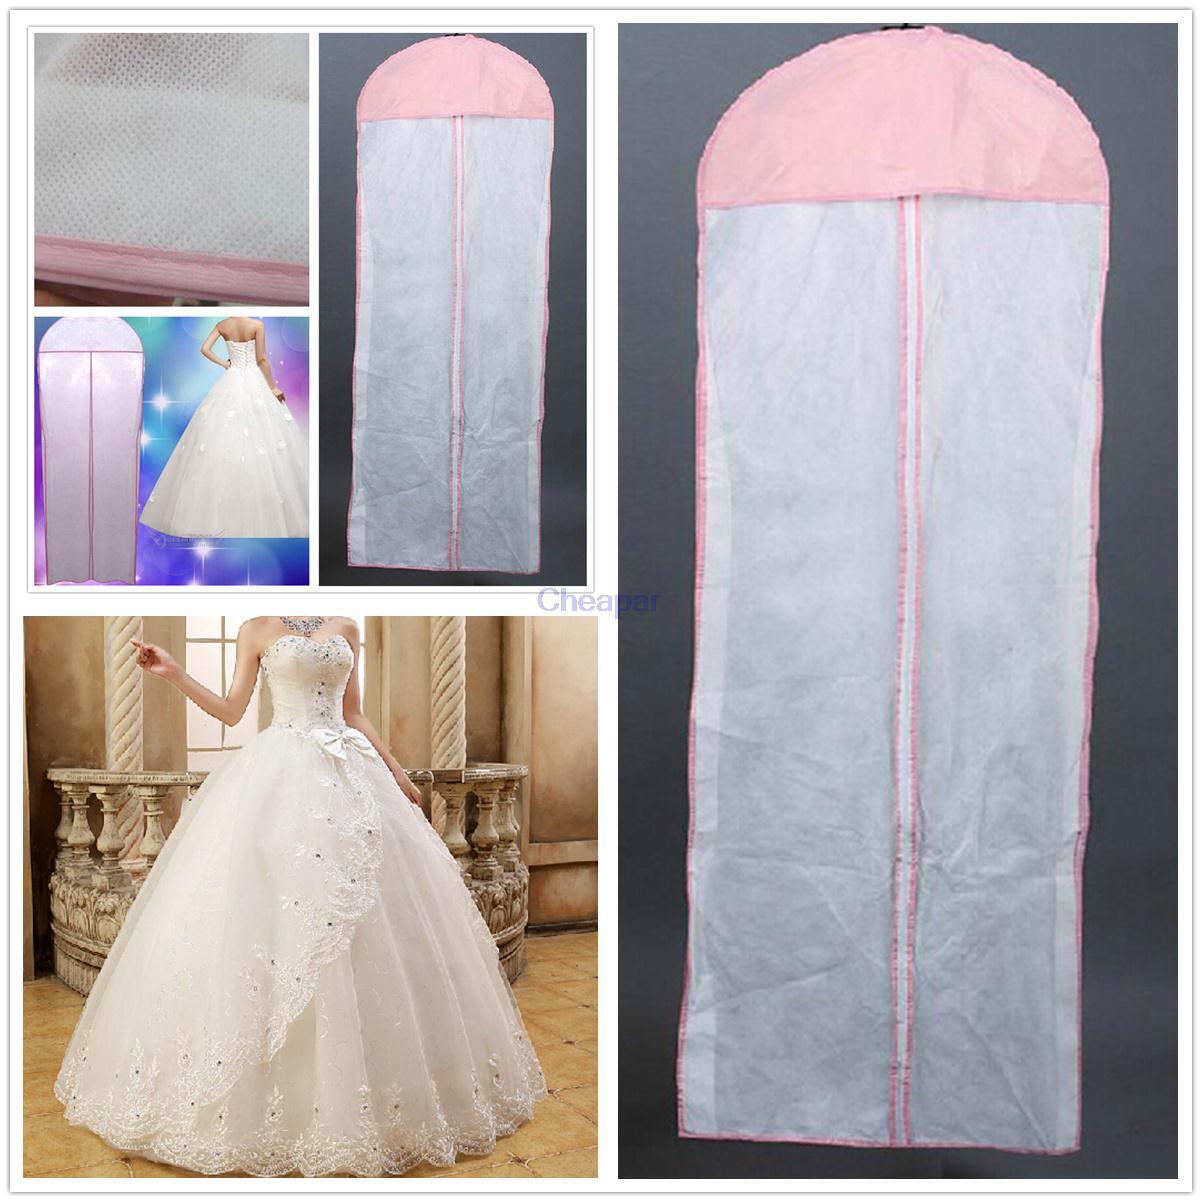 amelia casablanca dress wedding dress garment bag Amelia Casablanca Dress